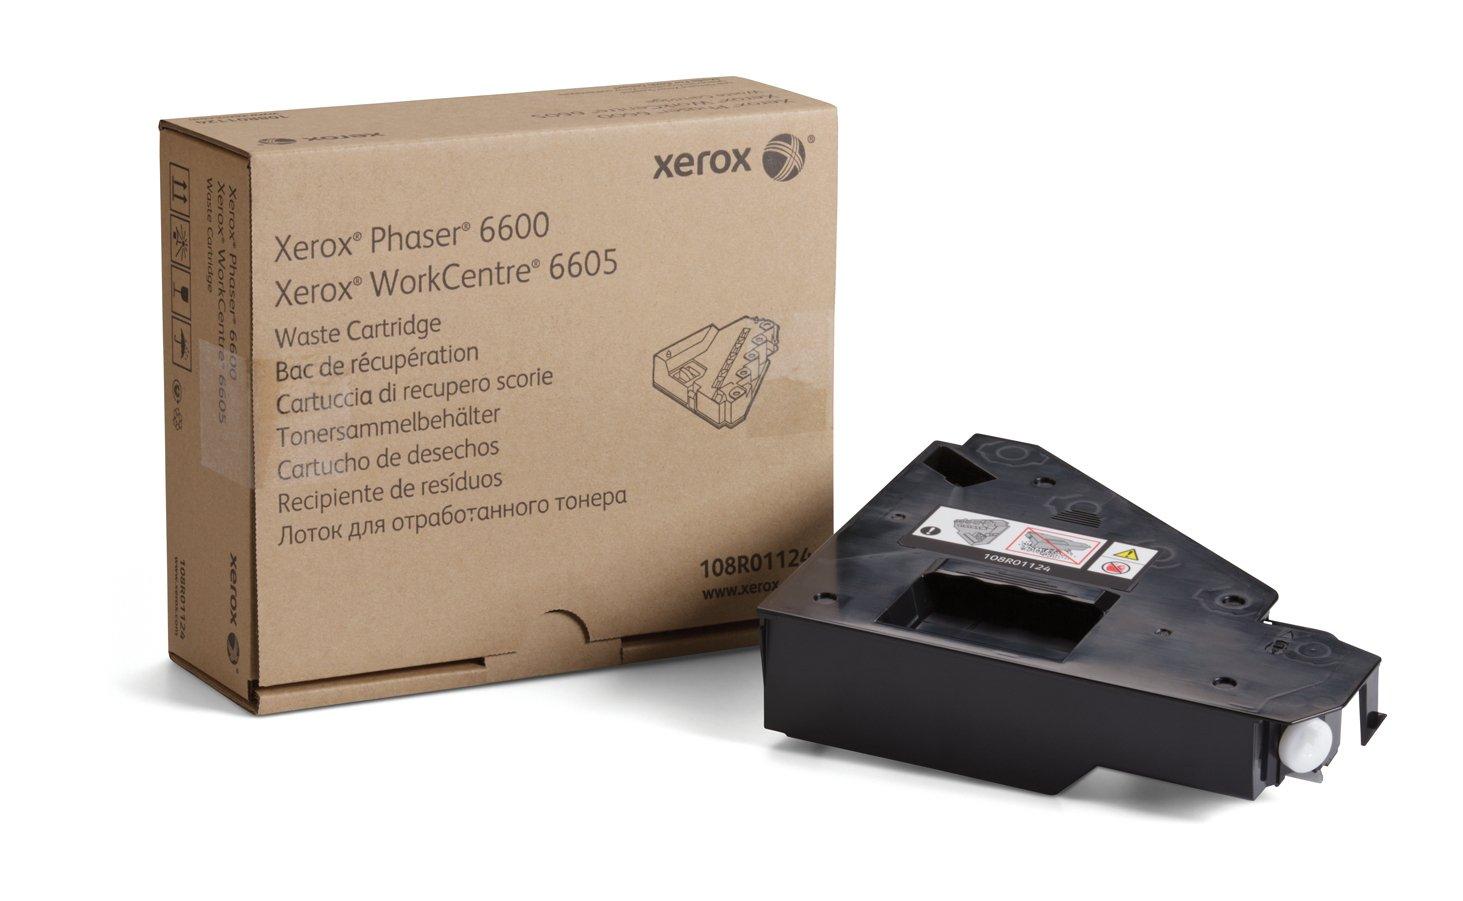 Xerox 108R1124 T/óner residual